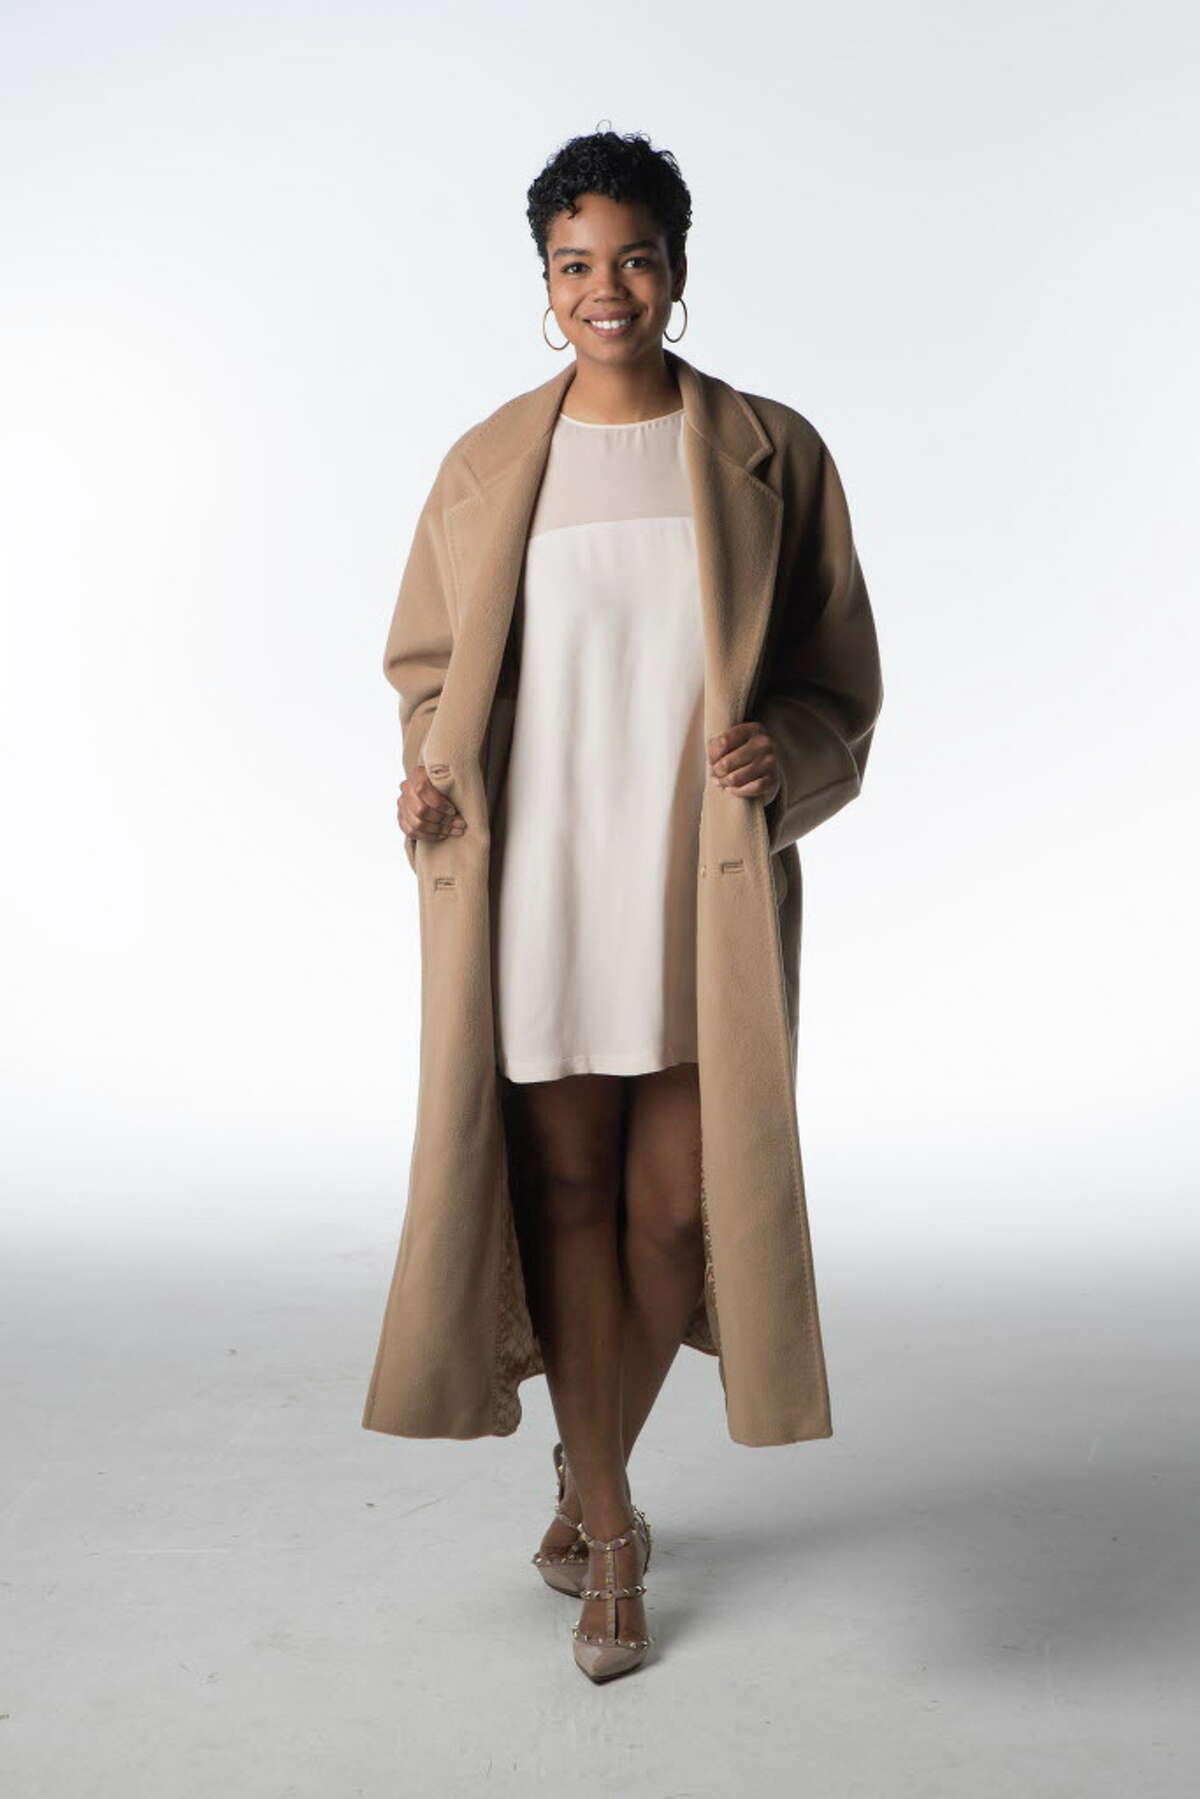 Jailyn Marcel models Max Mara's iconic 101801 coat